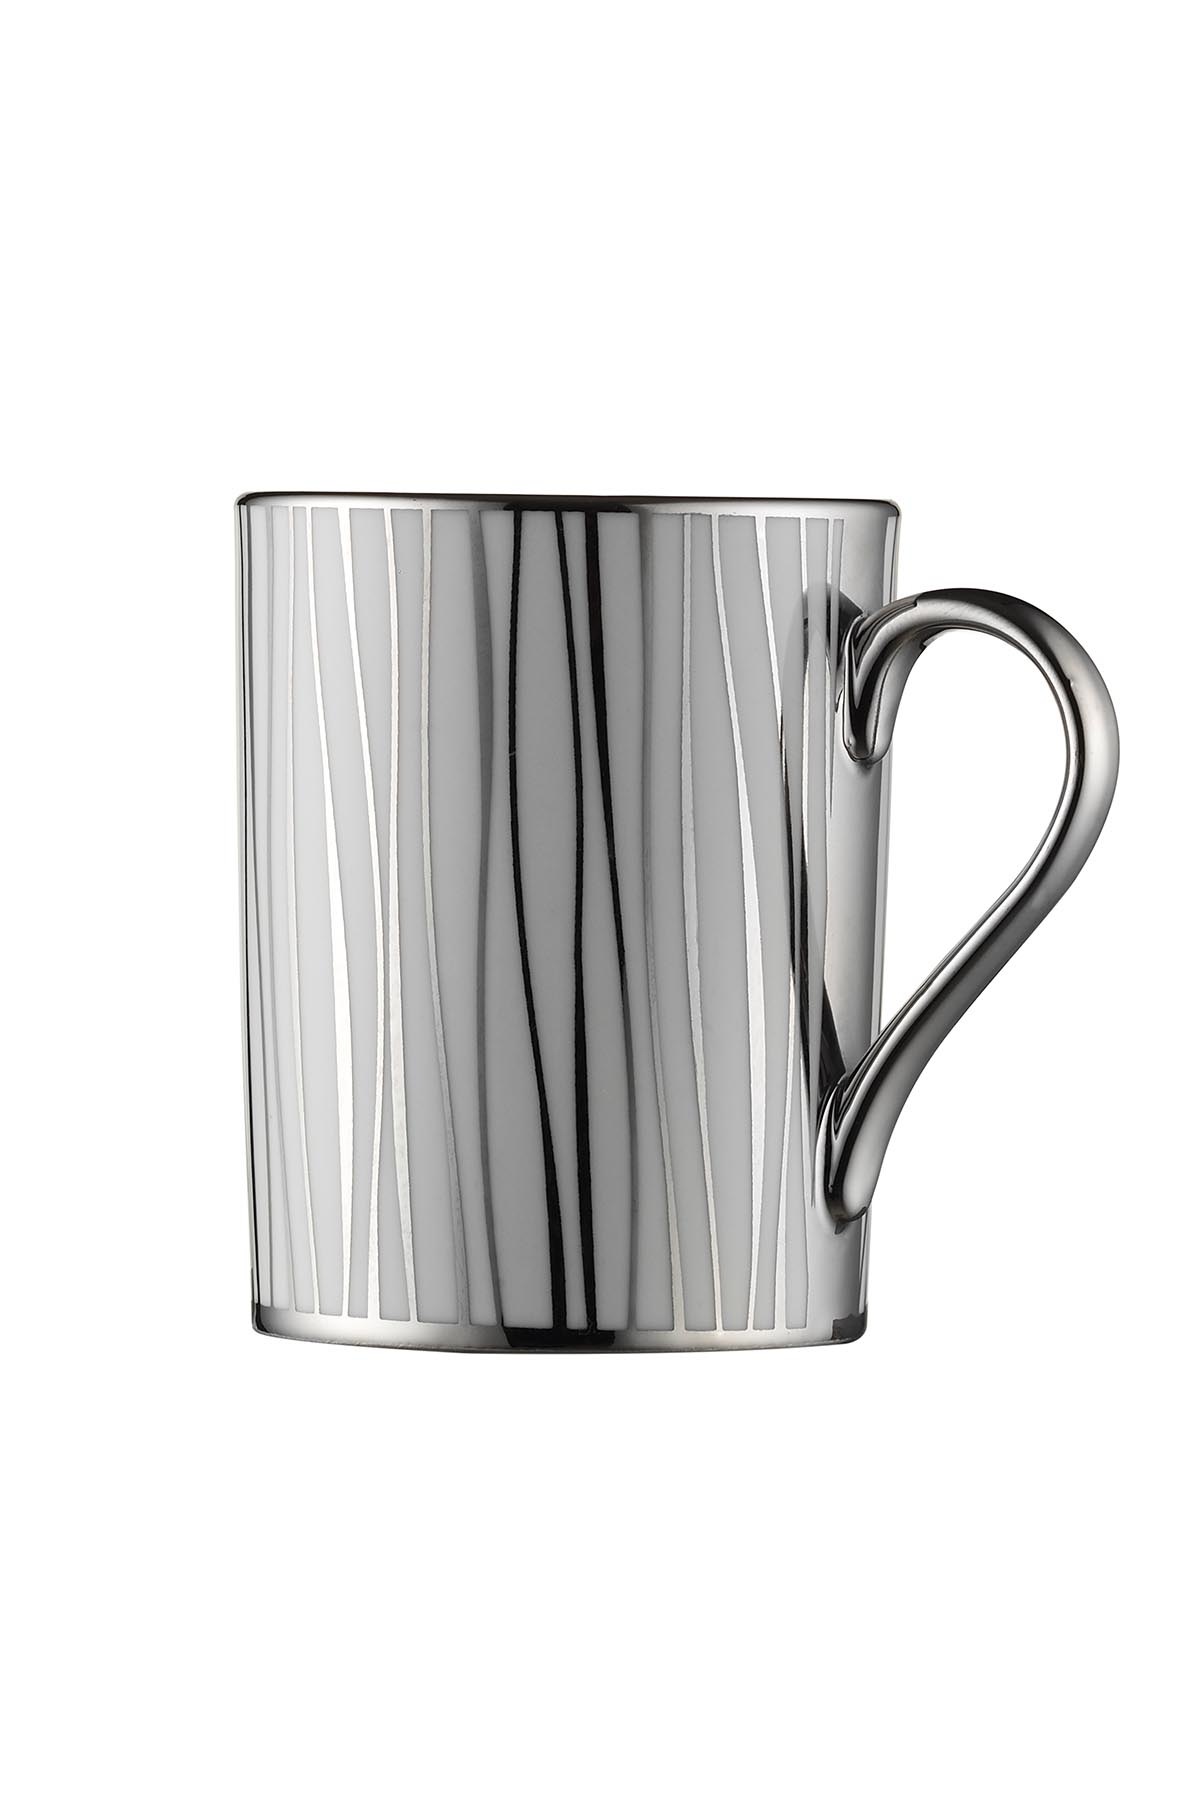 Kütahya Porselen Forest 2′li Mug Bardak Platin 10925